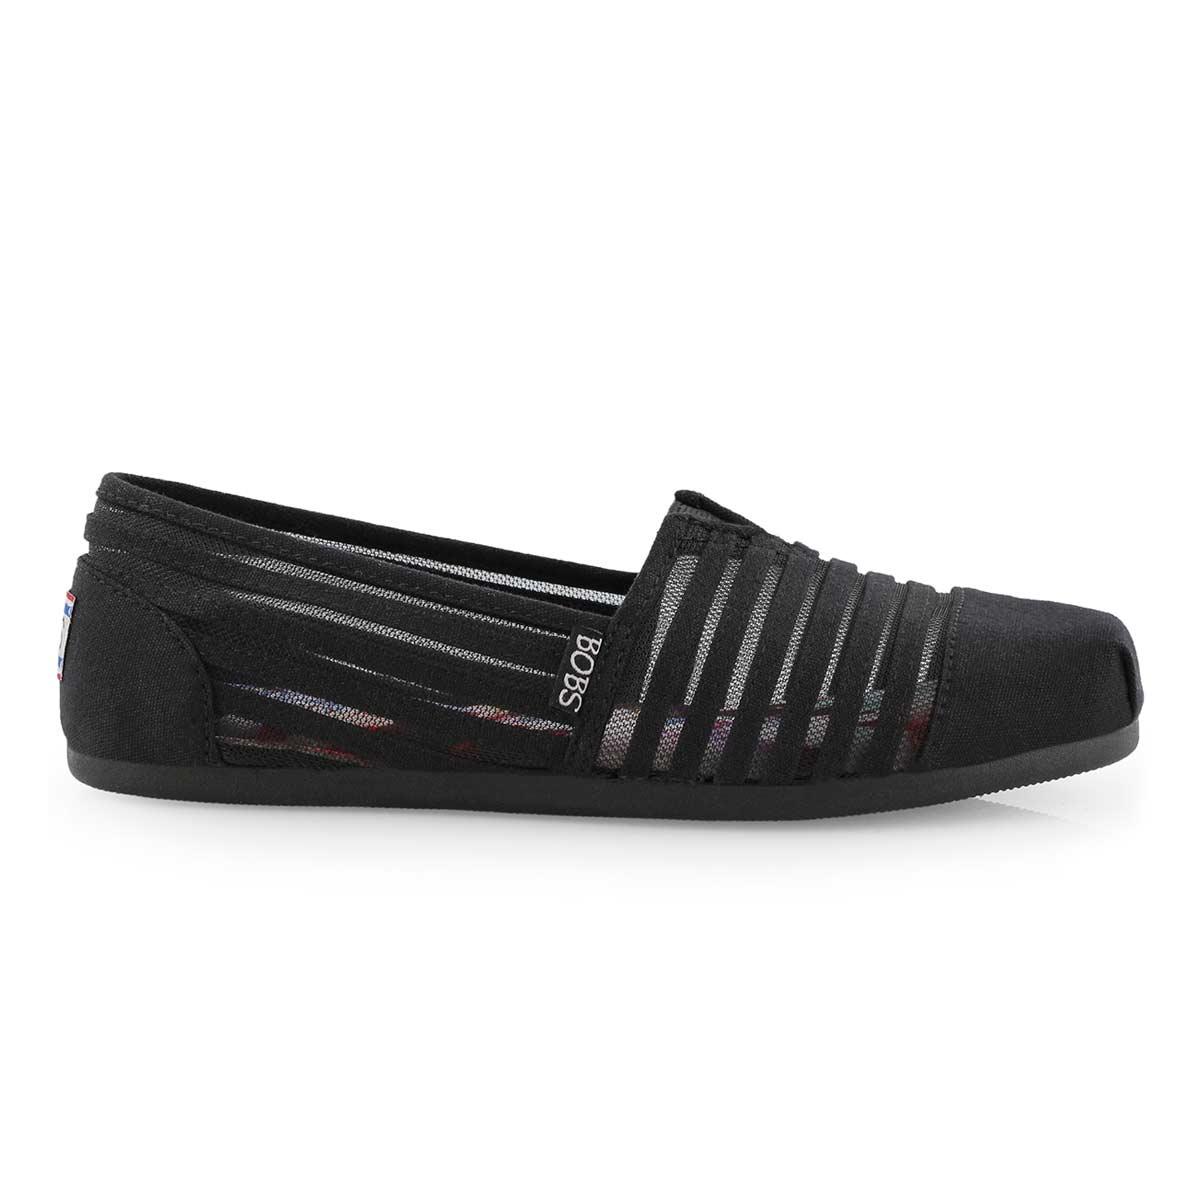 Lds Bobs Plush Adorbs blk slip on shoe